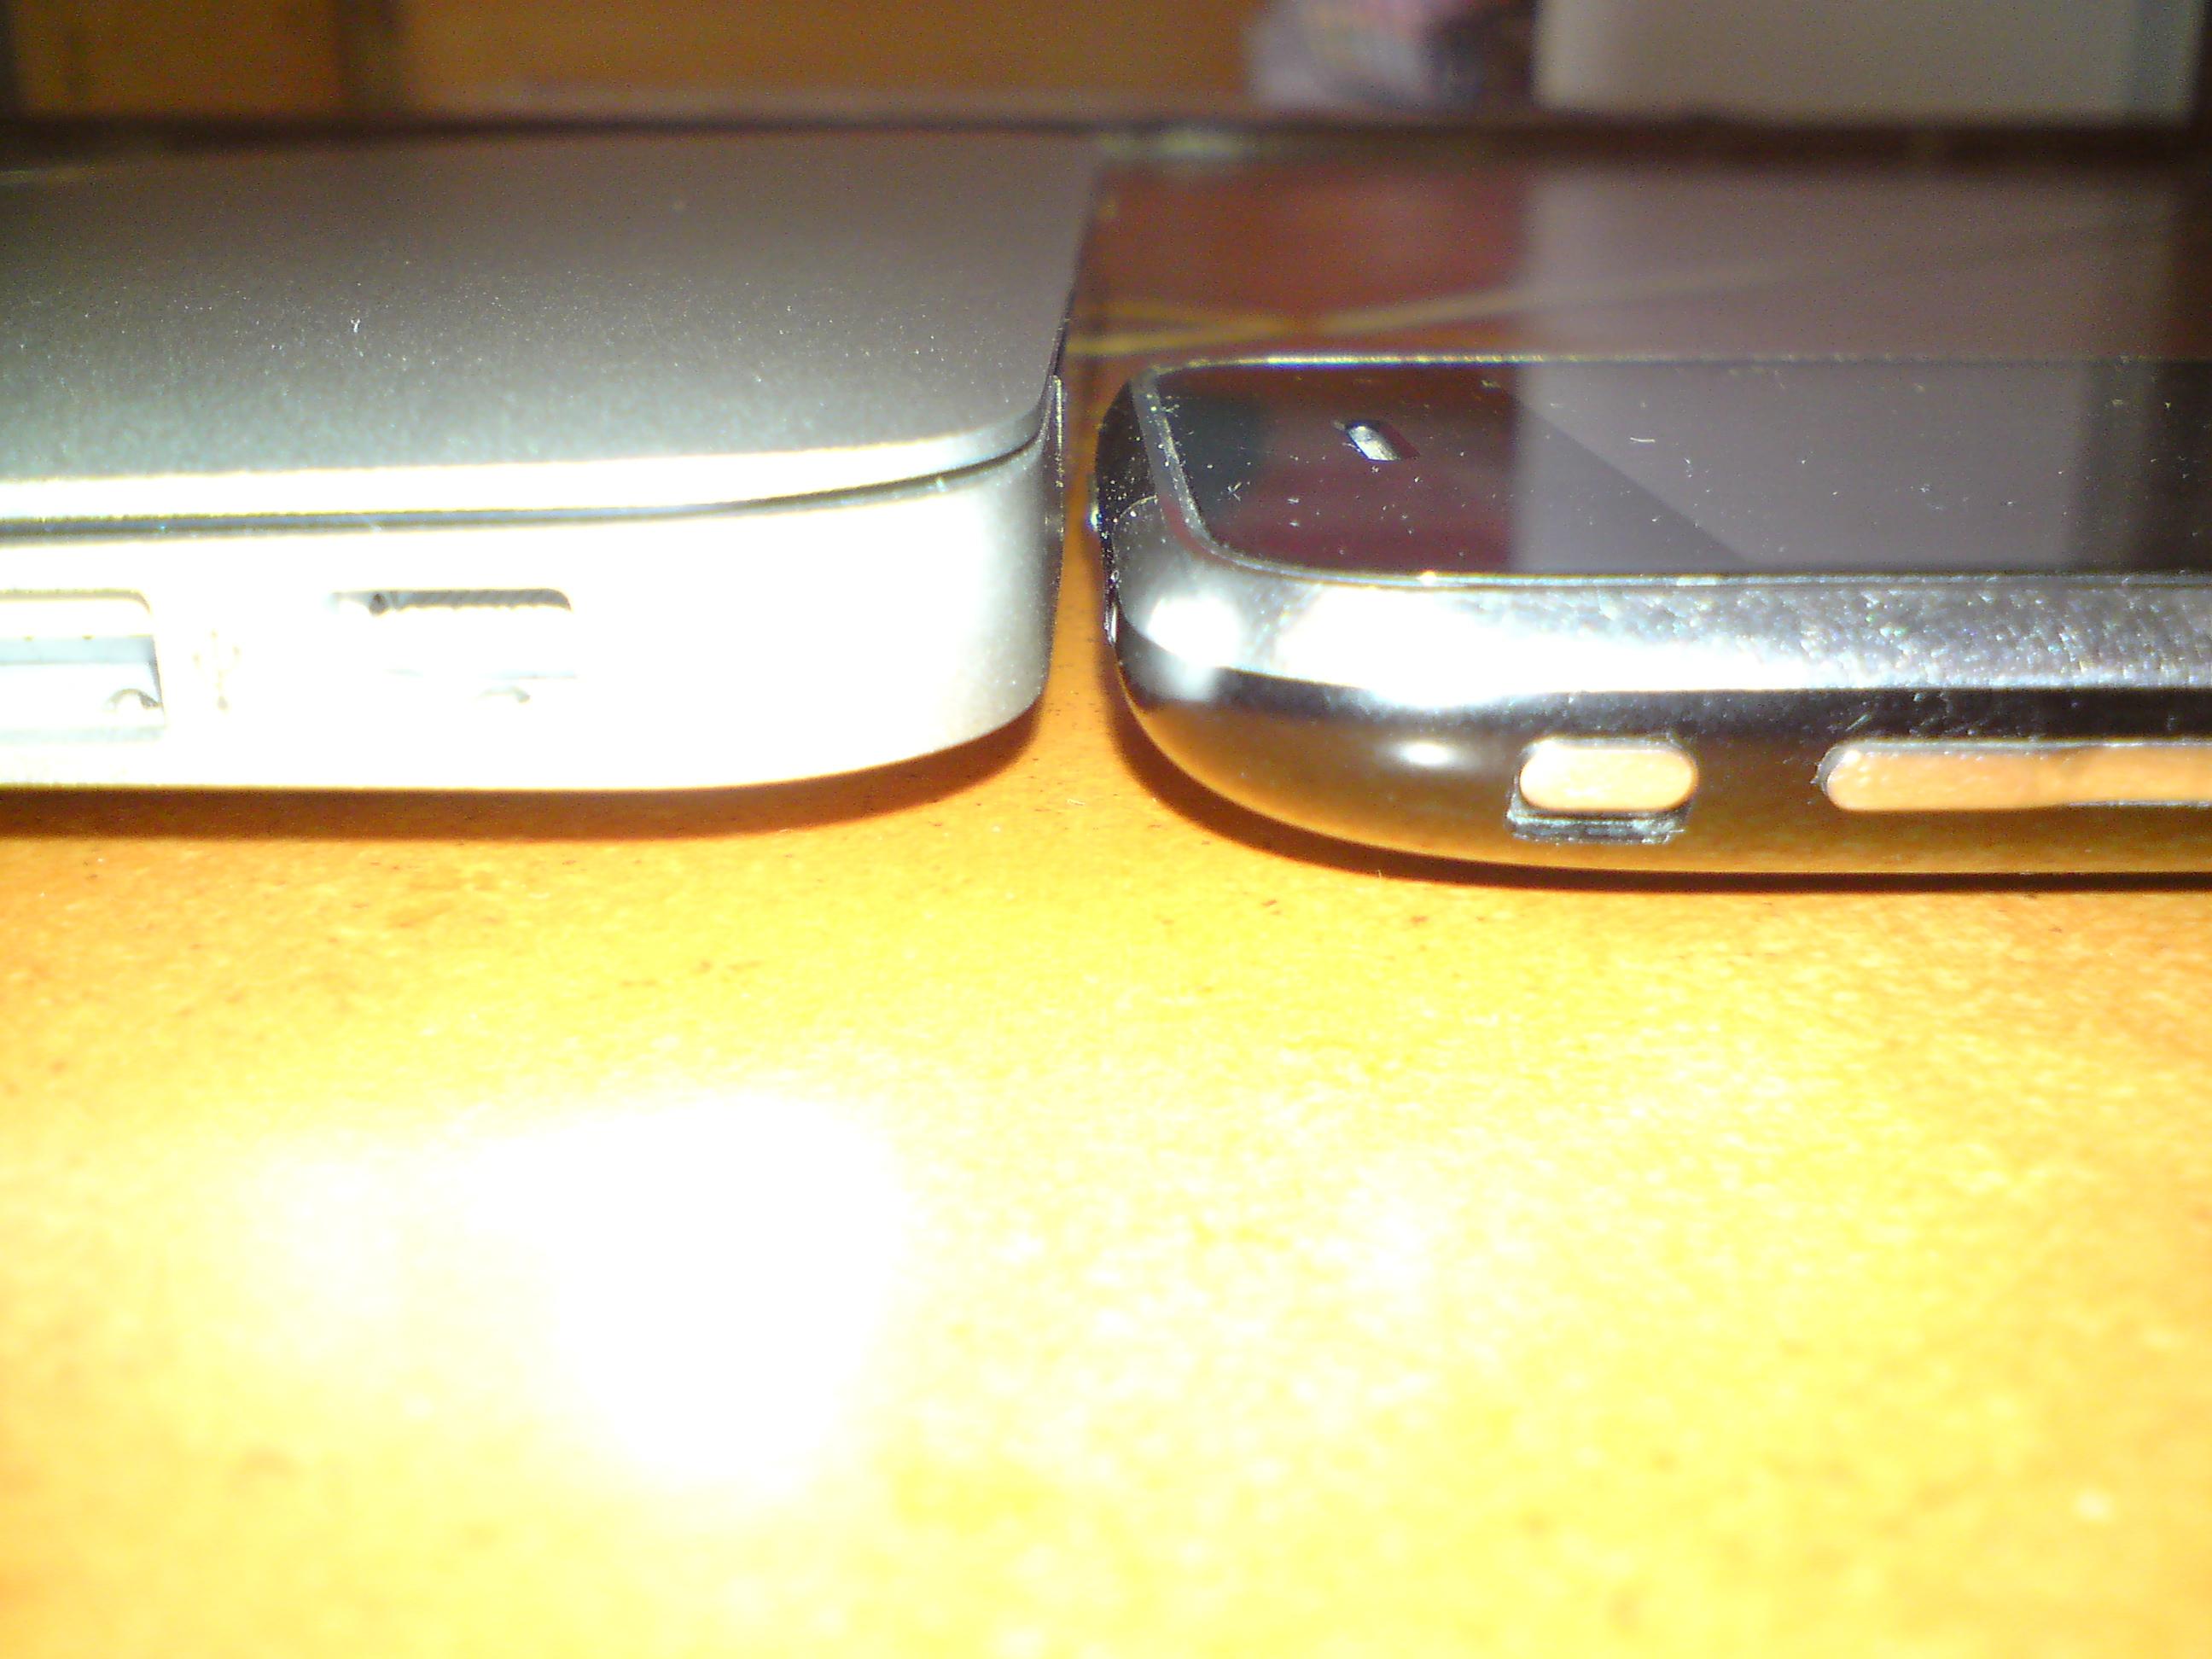 MacBook Air_porovnání s iPhonem2